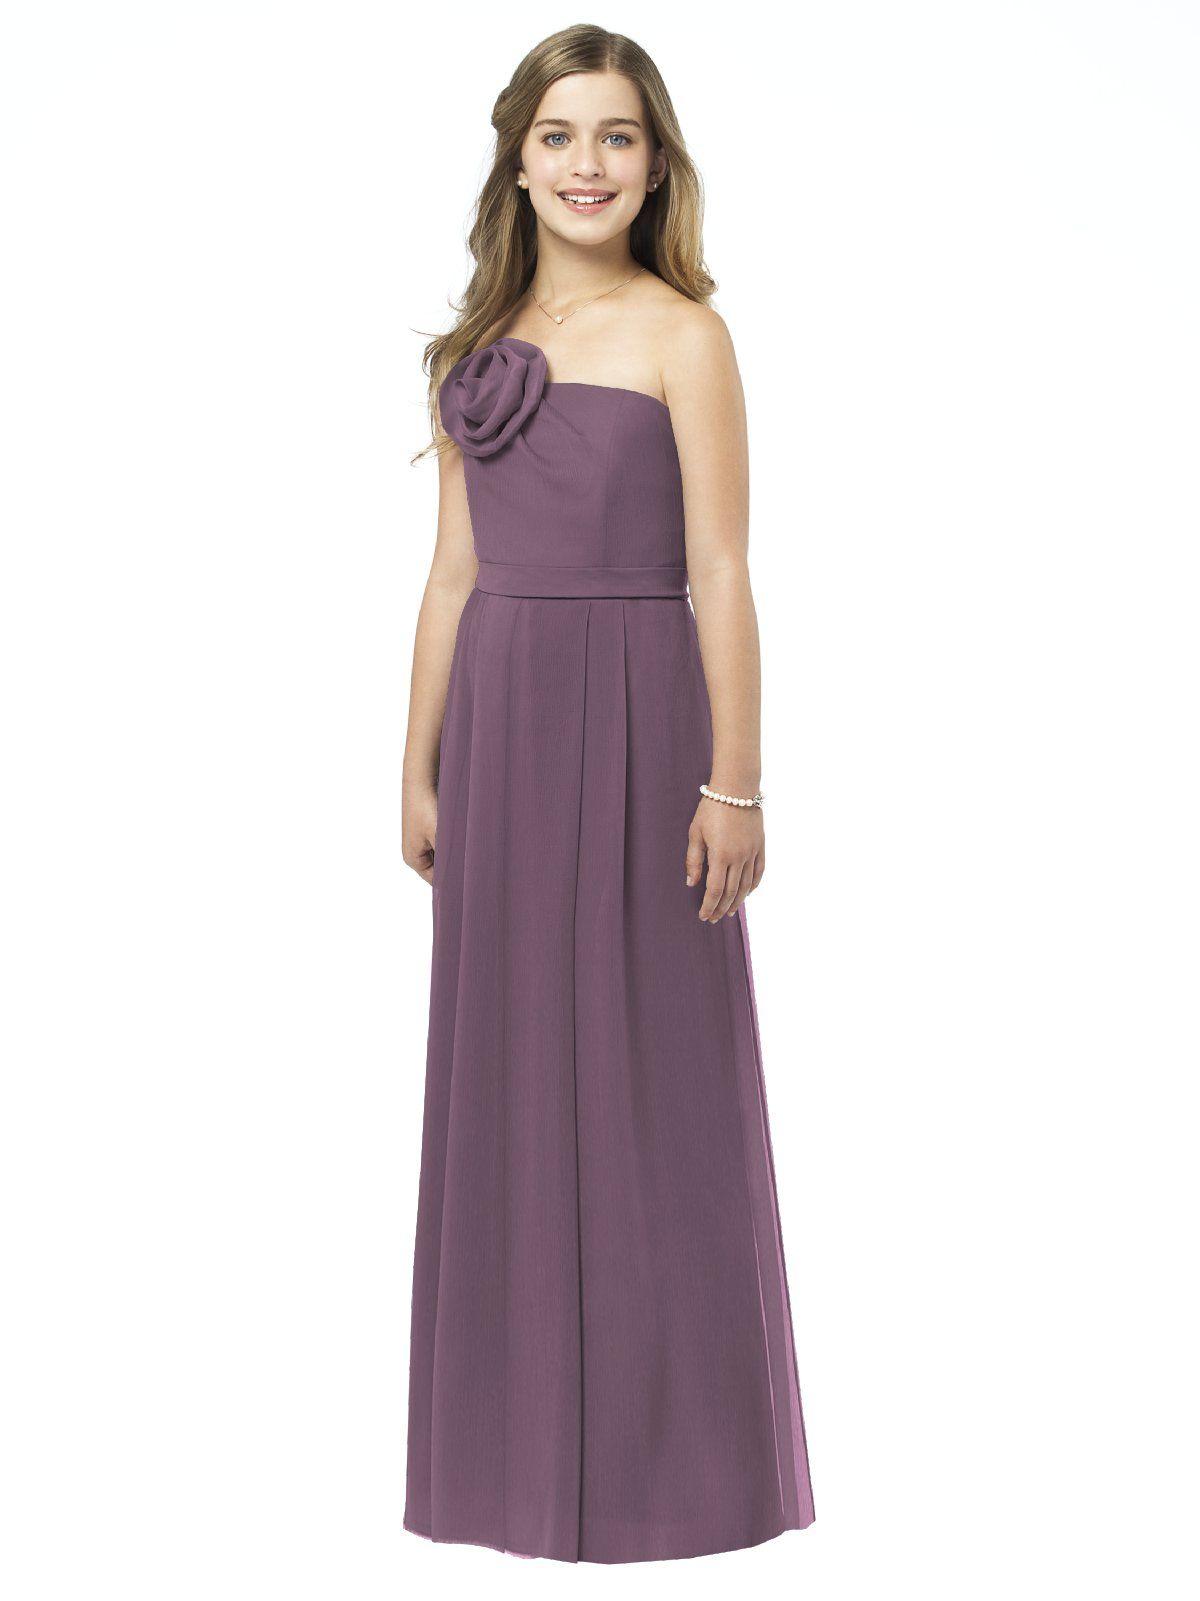 Jenny\'s junior bridesmaid dress! | Wedding Ideas | Pinterest ...